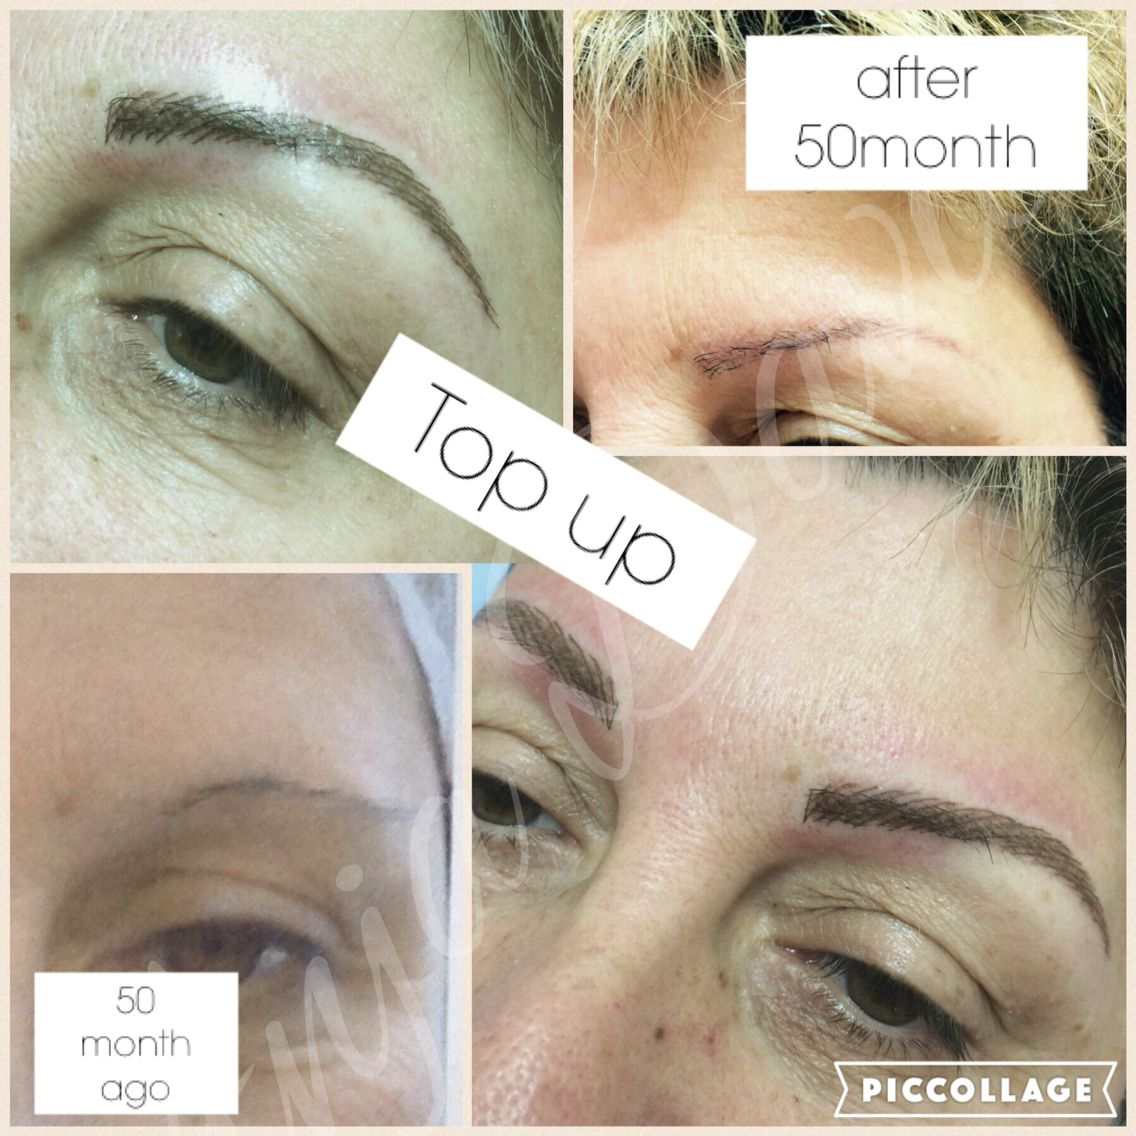 Pin on Semipermanent Makeup , tattooed Eyebrows, Eyeliner